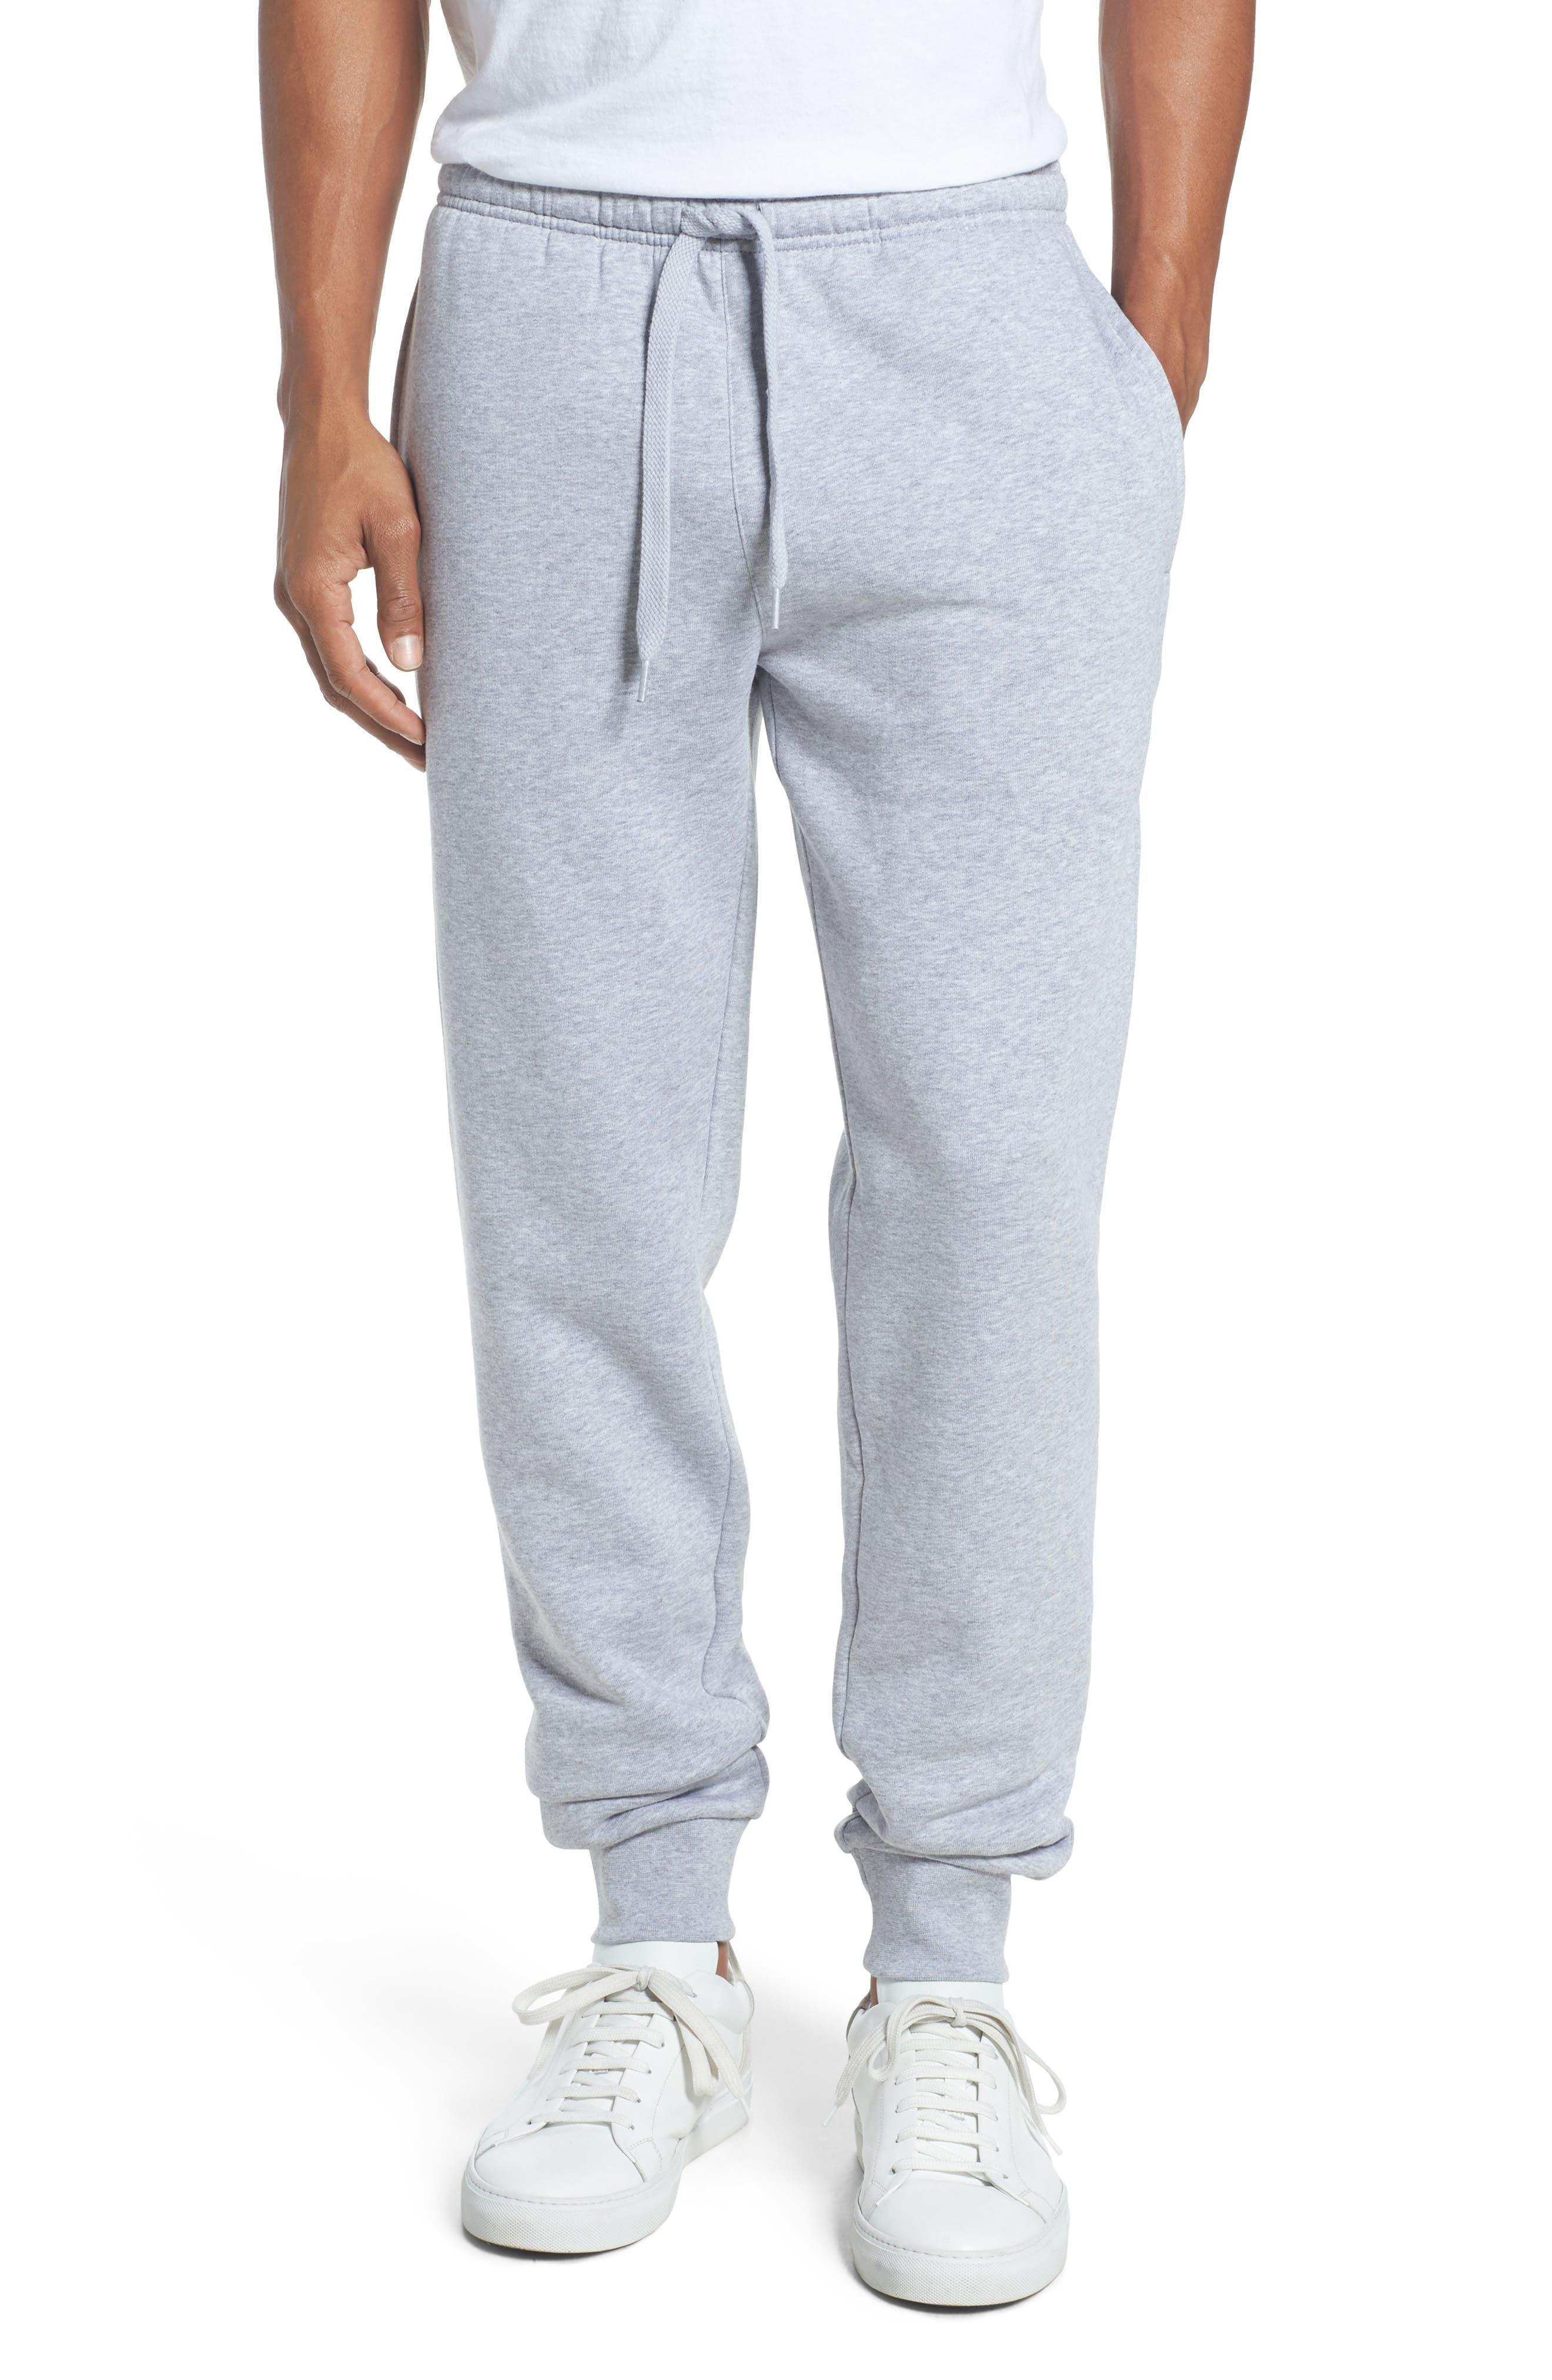 Sport Track Pants,                         Main,                         color, 034